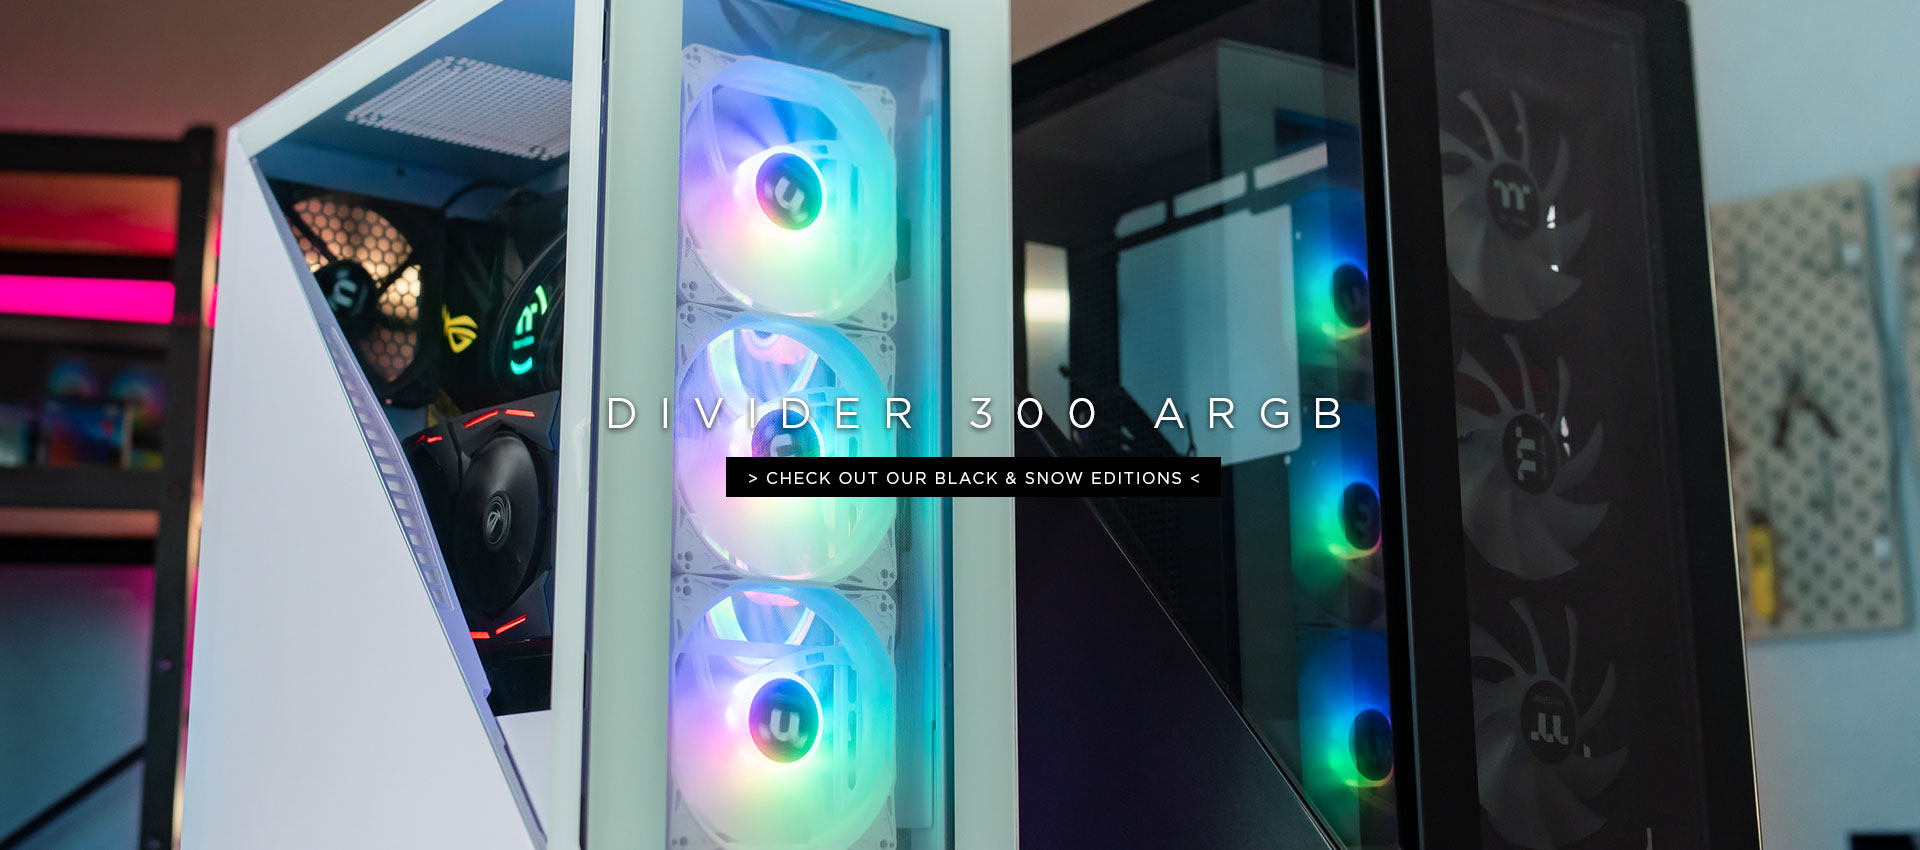 Divider 300 ARGB Mid Tower Case